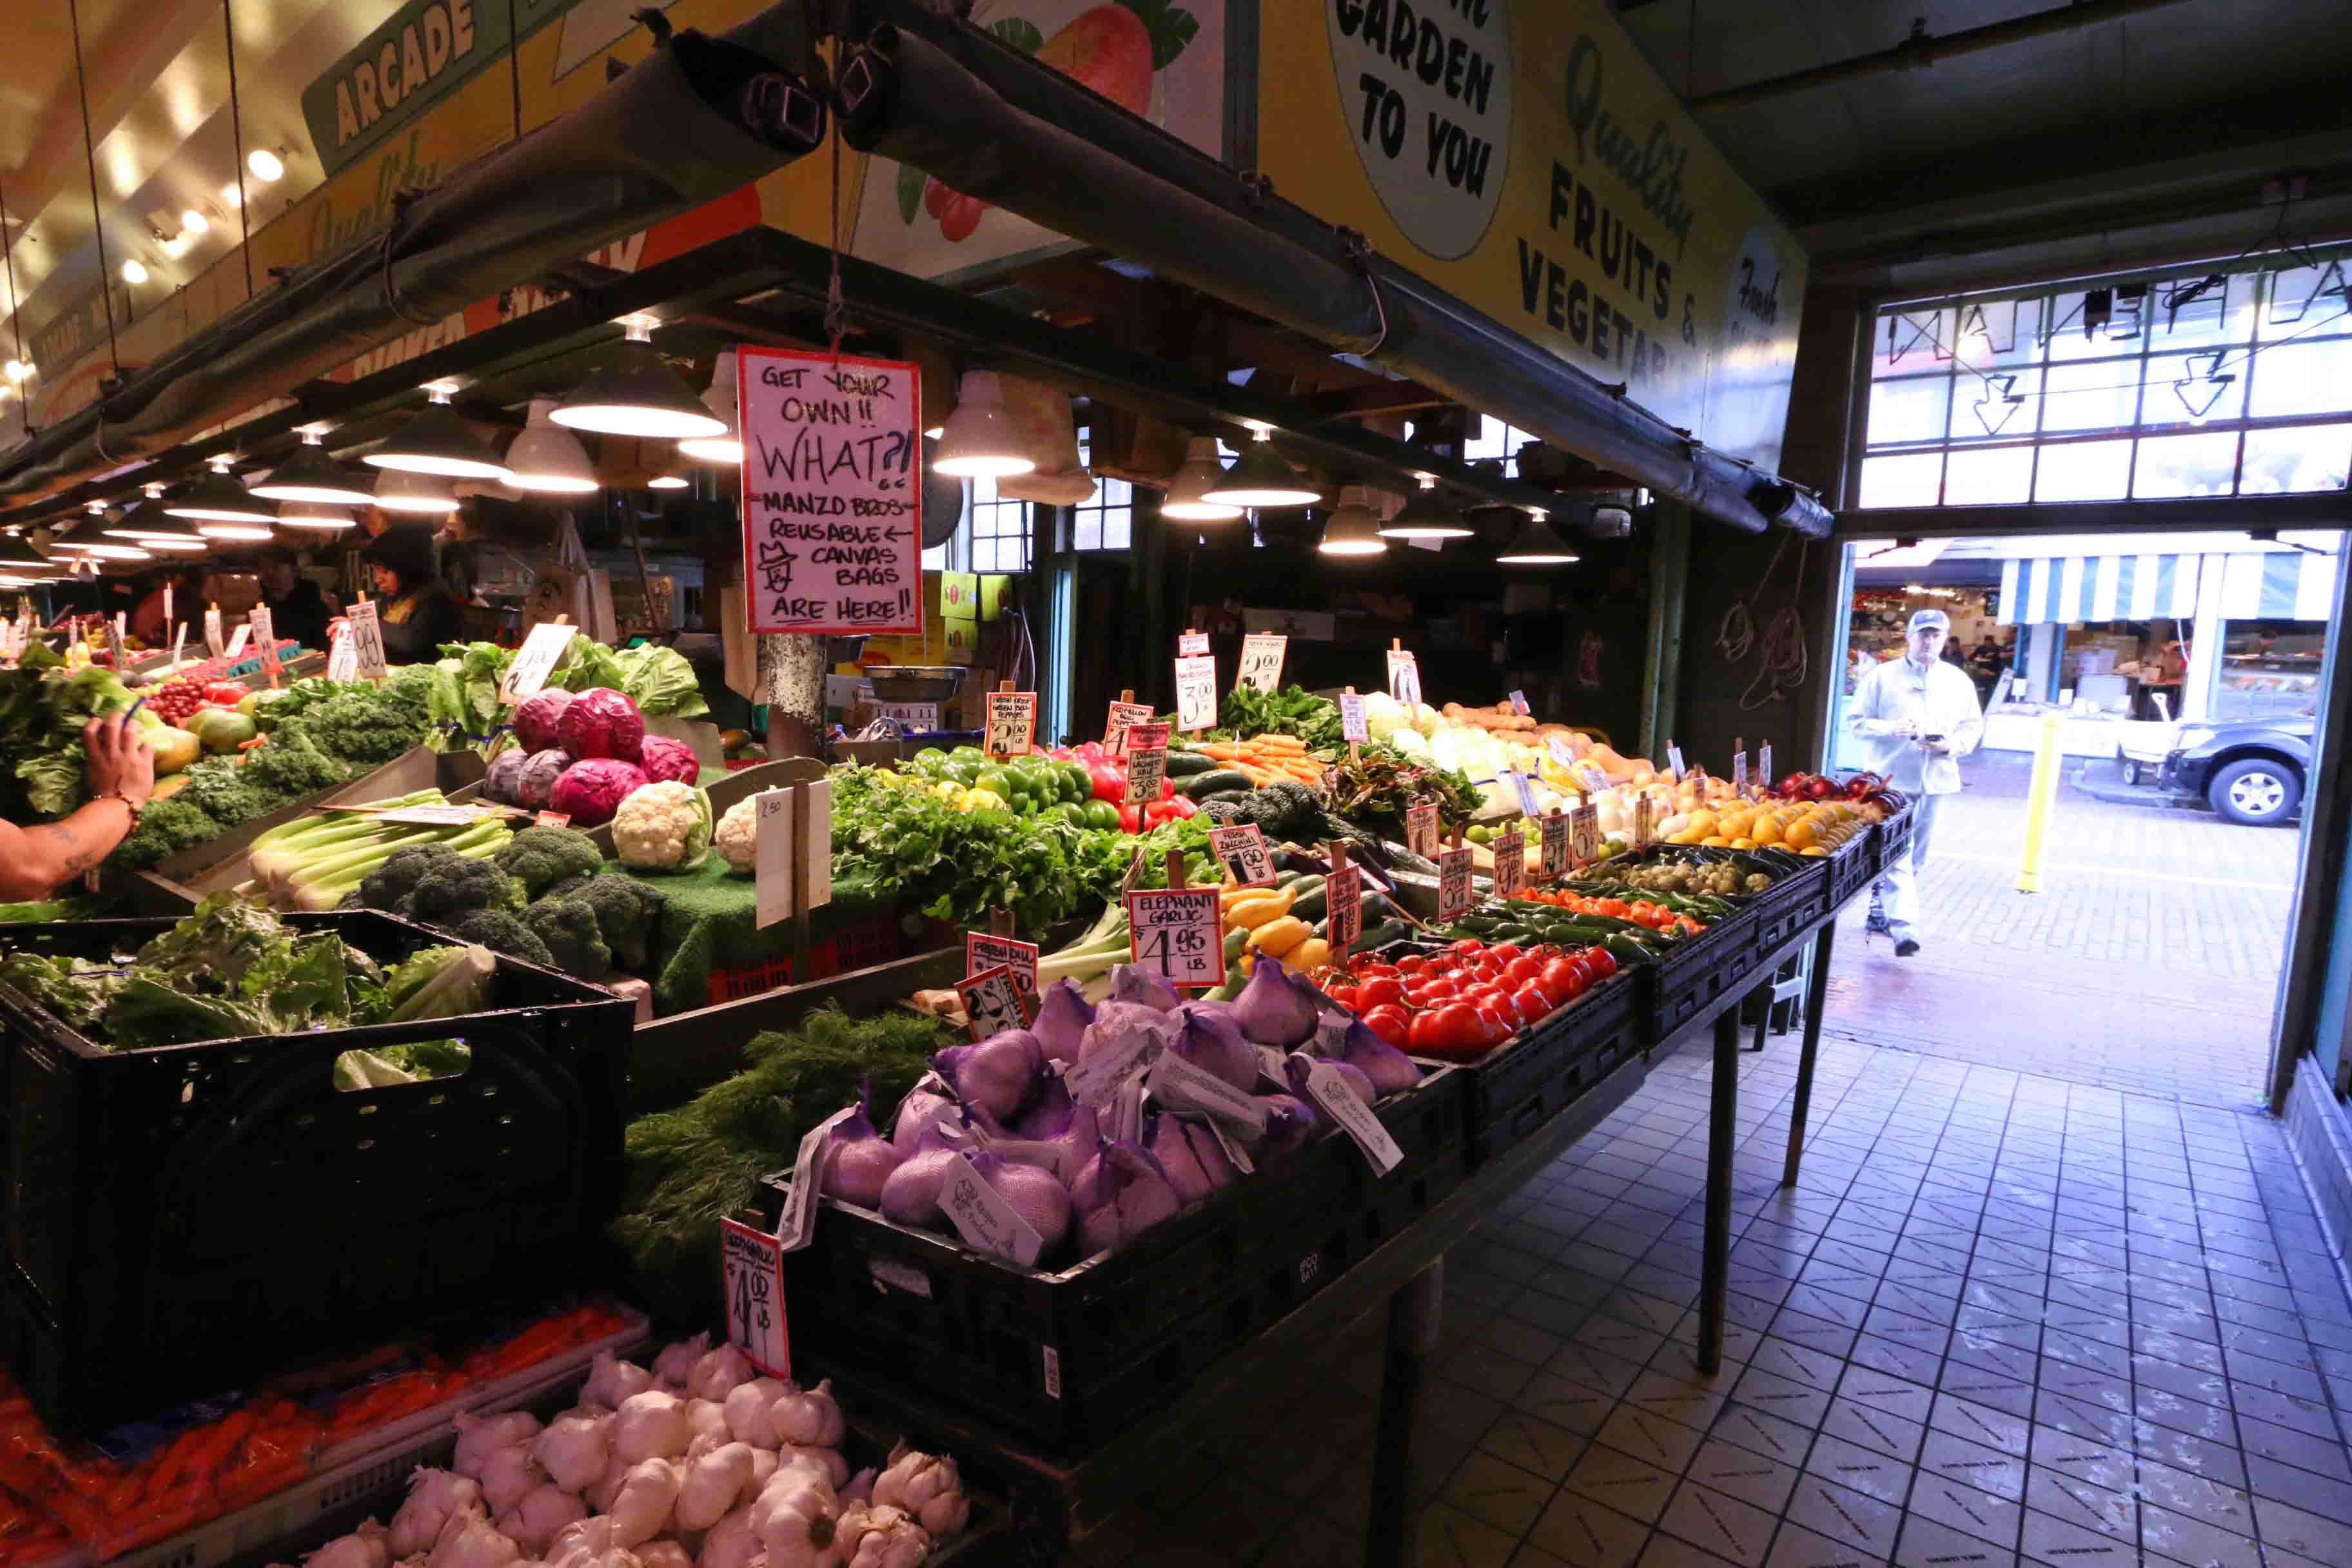 Market 36